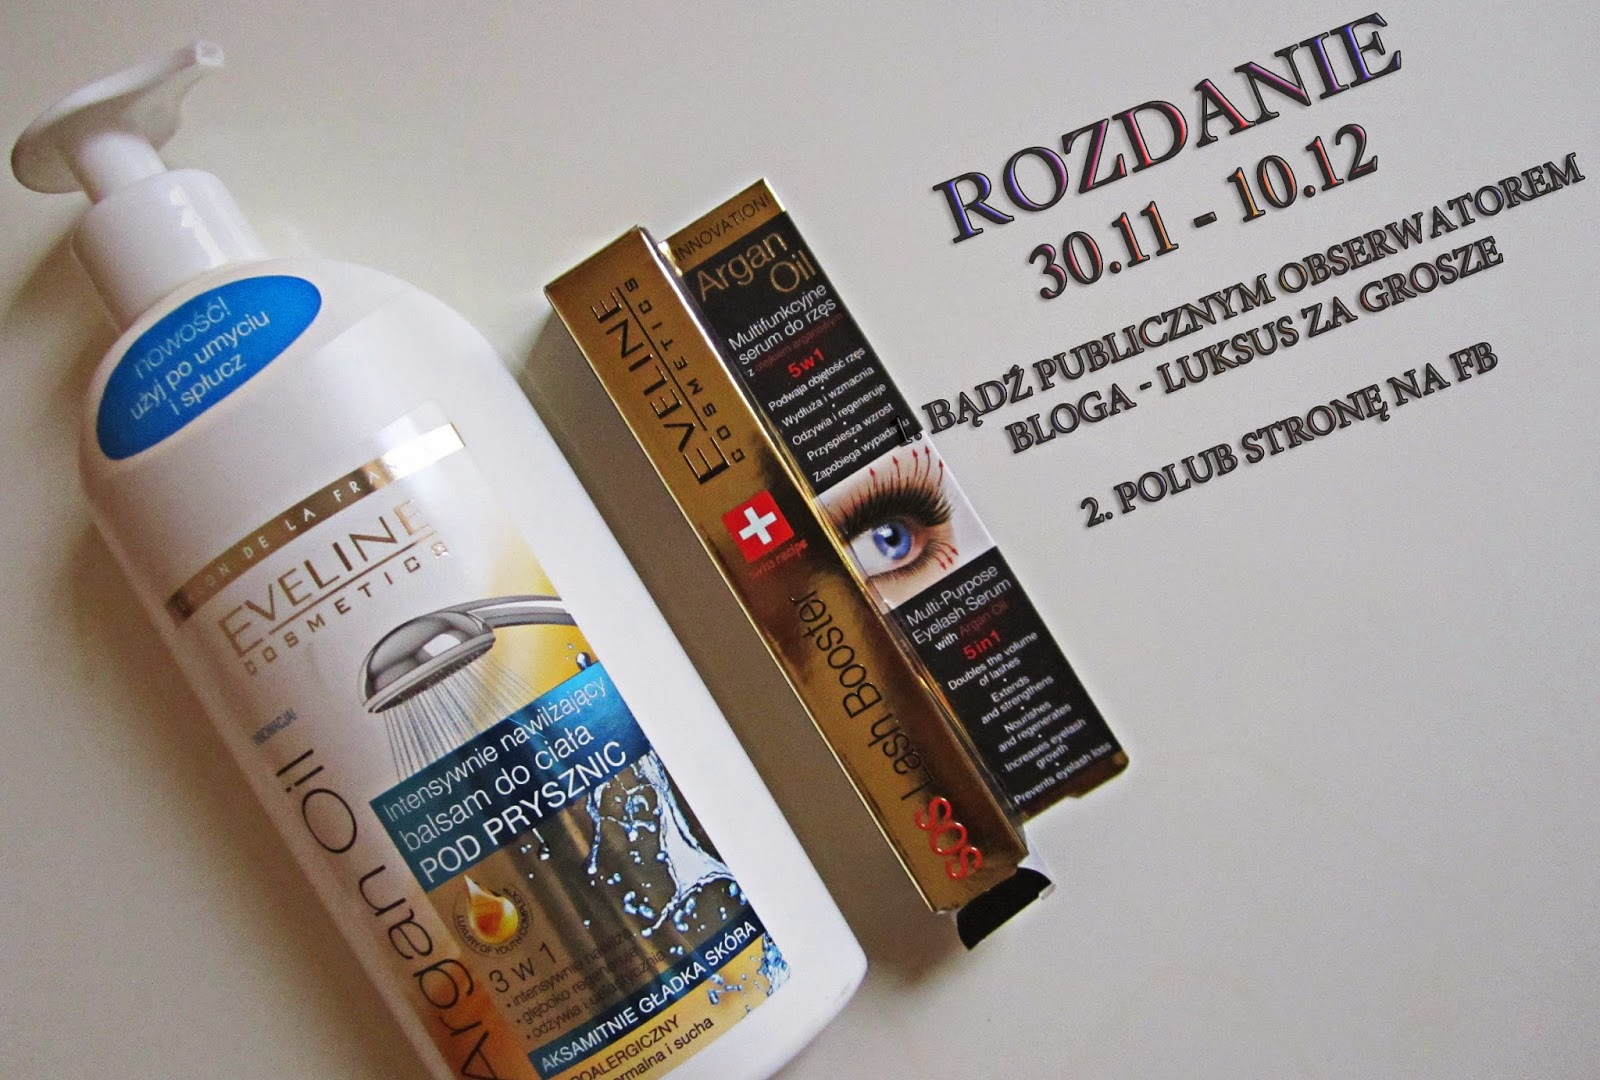 http://luksuszagrosze.blogspot.com/2014/11/rozdanie.html